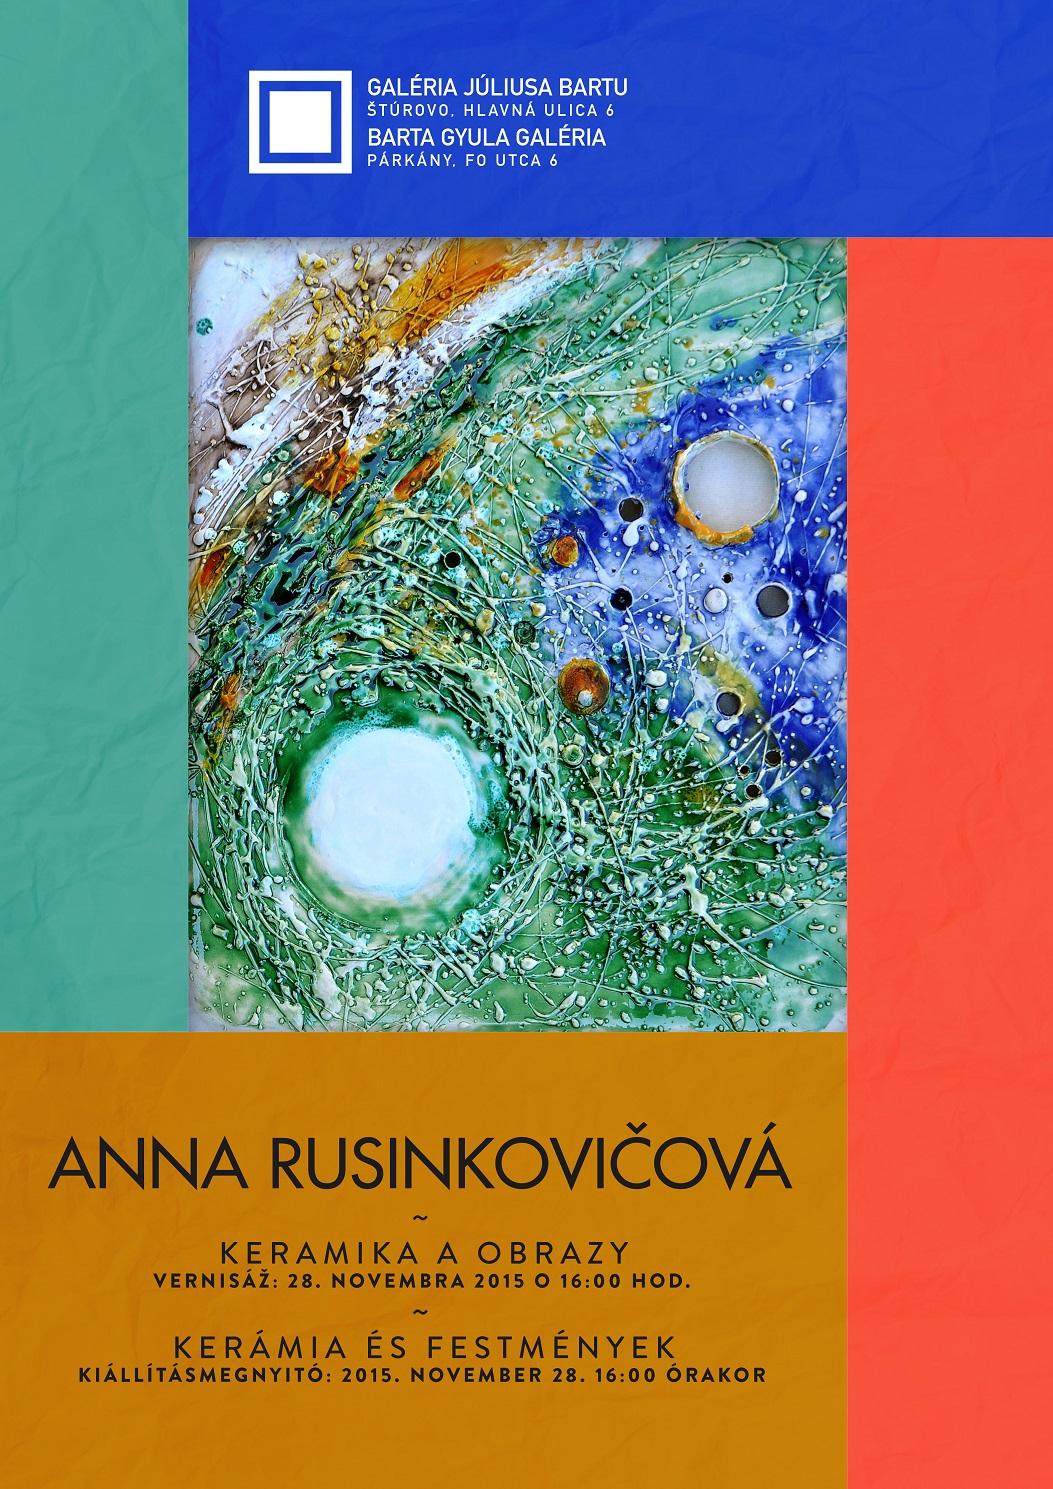 rusinkovicova_web.jpg